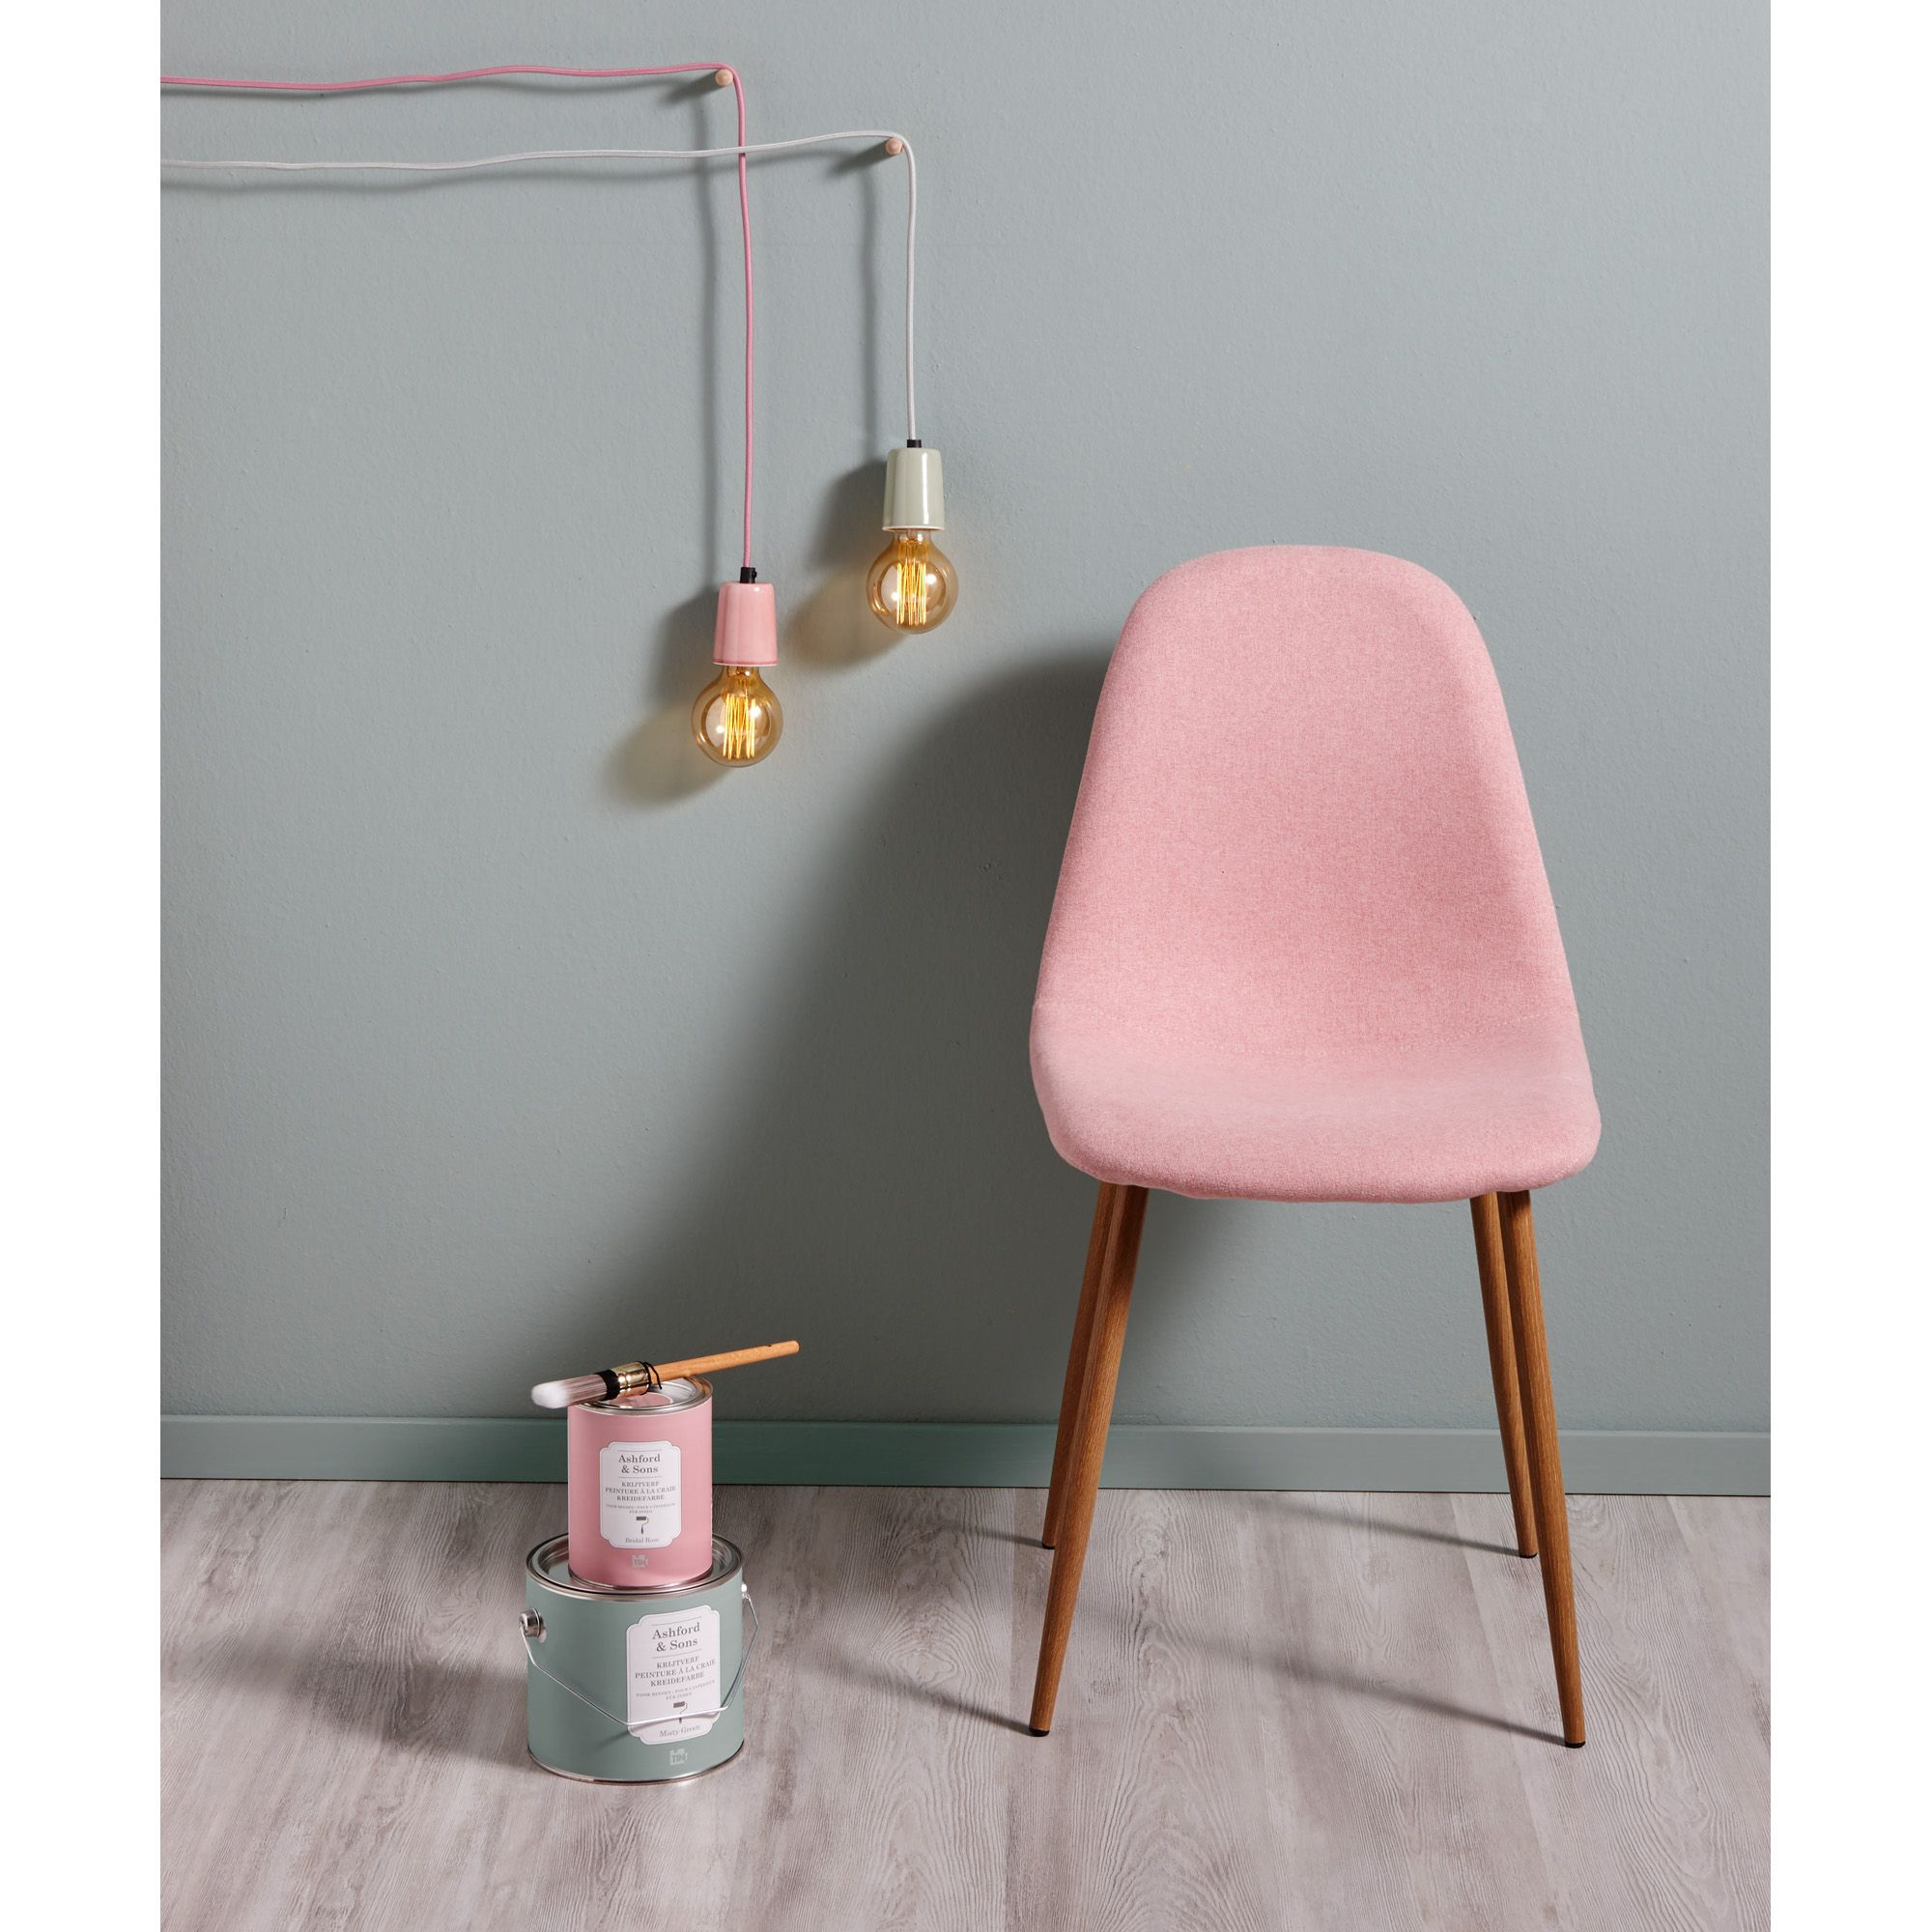 Match je kleur verf met je accessoires! #wonen #interieur #DIY #verf ...